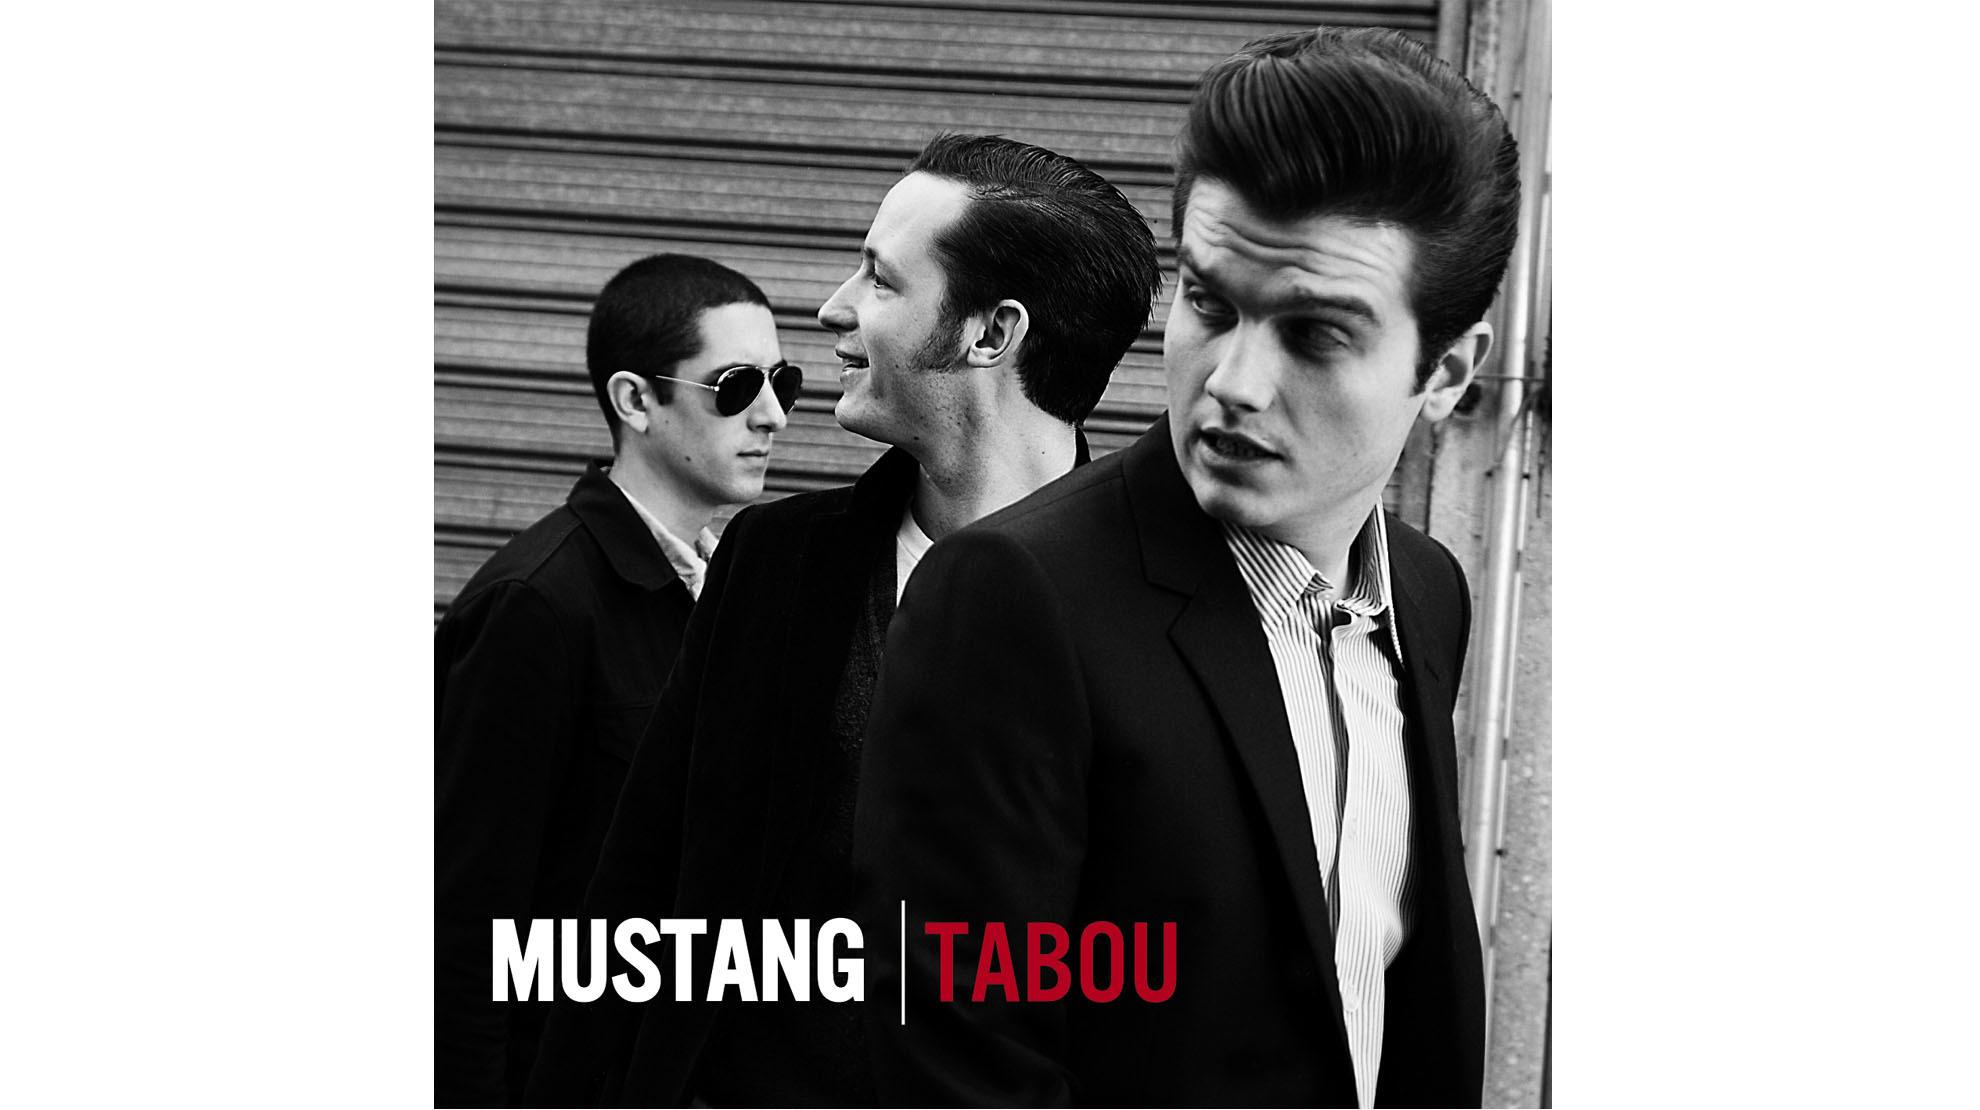 Mustang • Tabou (2011)